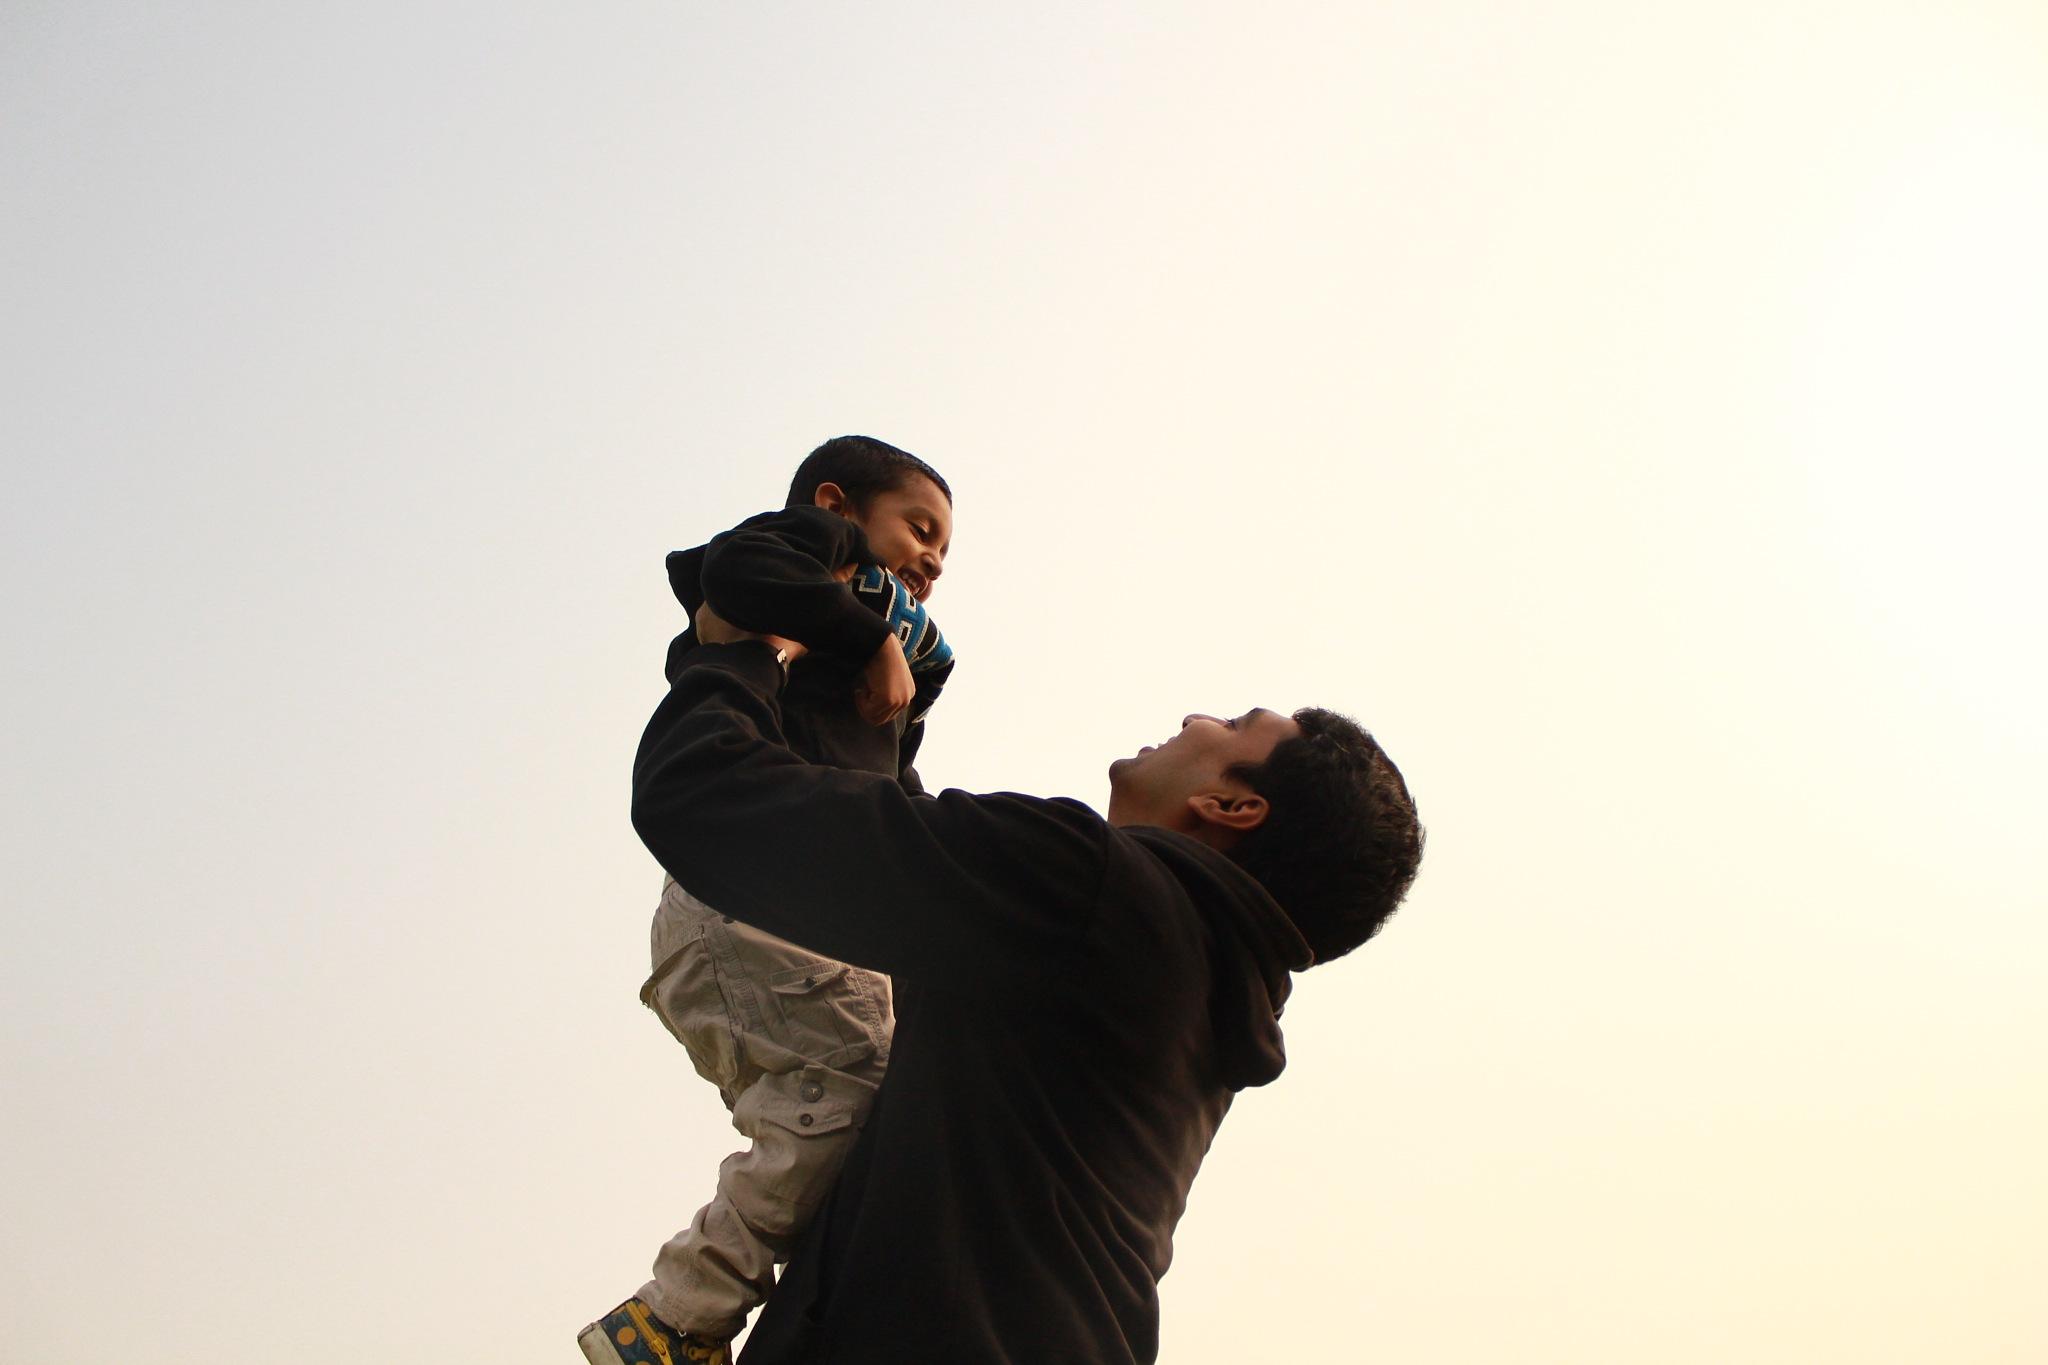 The father by Rafiqul Islam Tushar